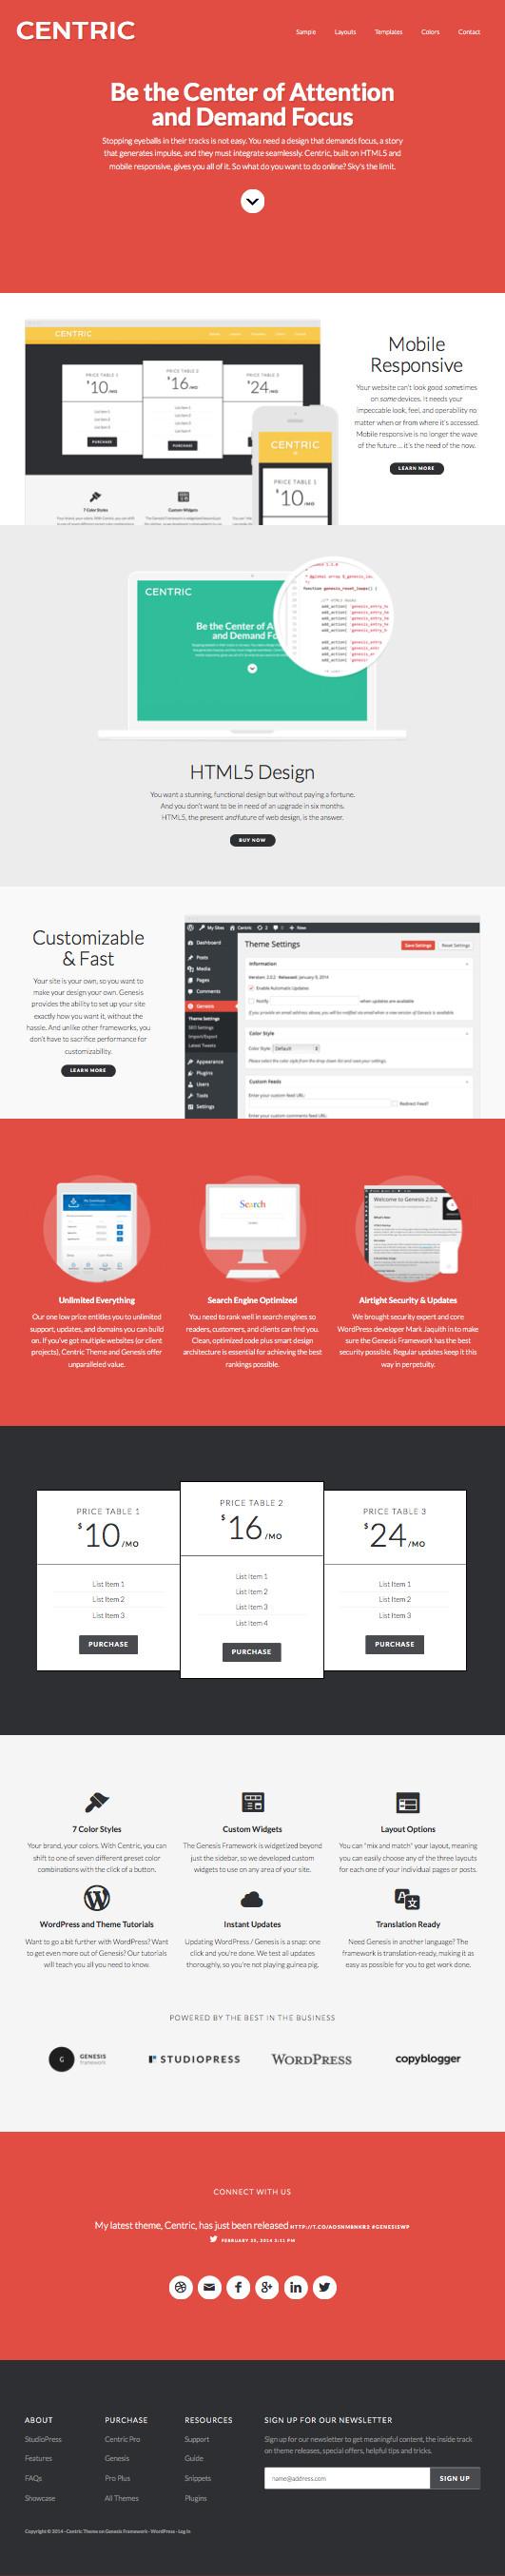 Centric Pro Web Designer Theme by Wpchats.com